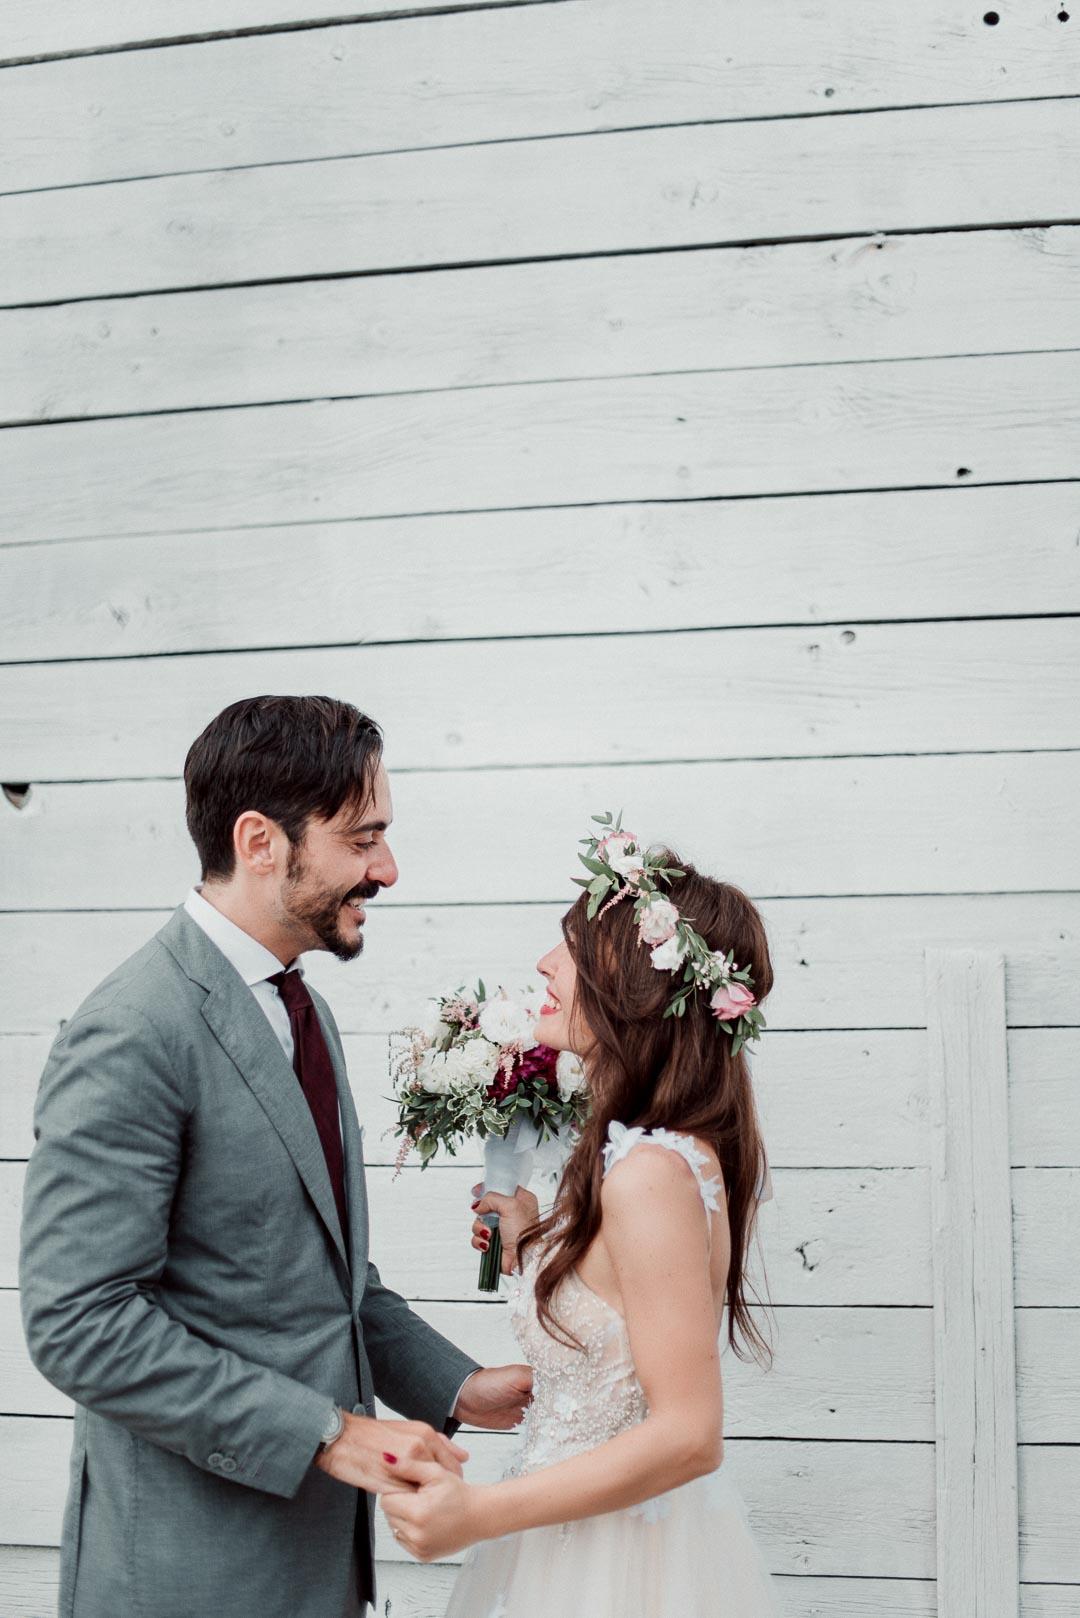 wedding-photographer-destination-fineart-bespoke-reportage-amalficoast-torrelacerniola-vivianeizzo-spazio46-66